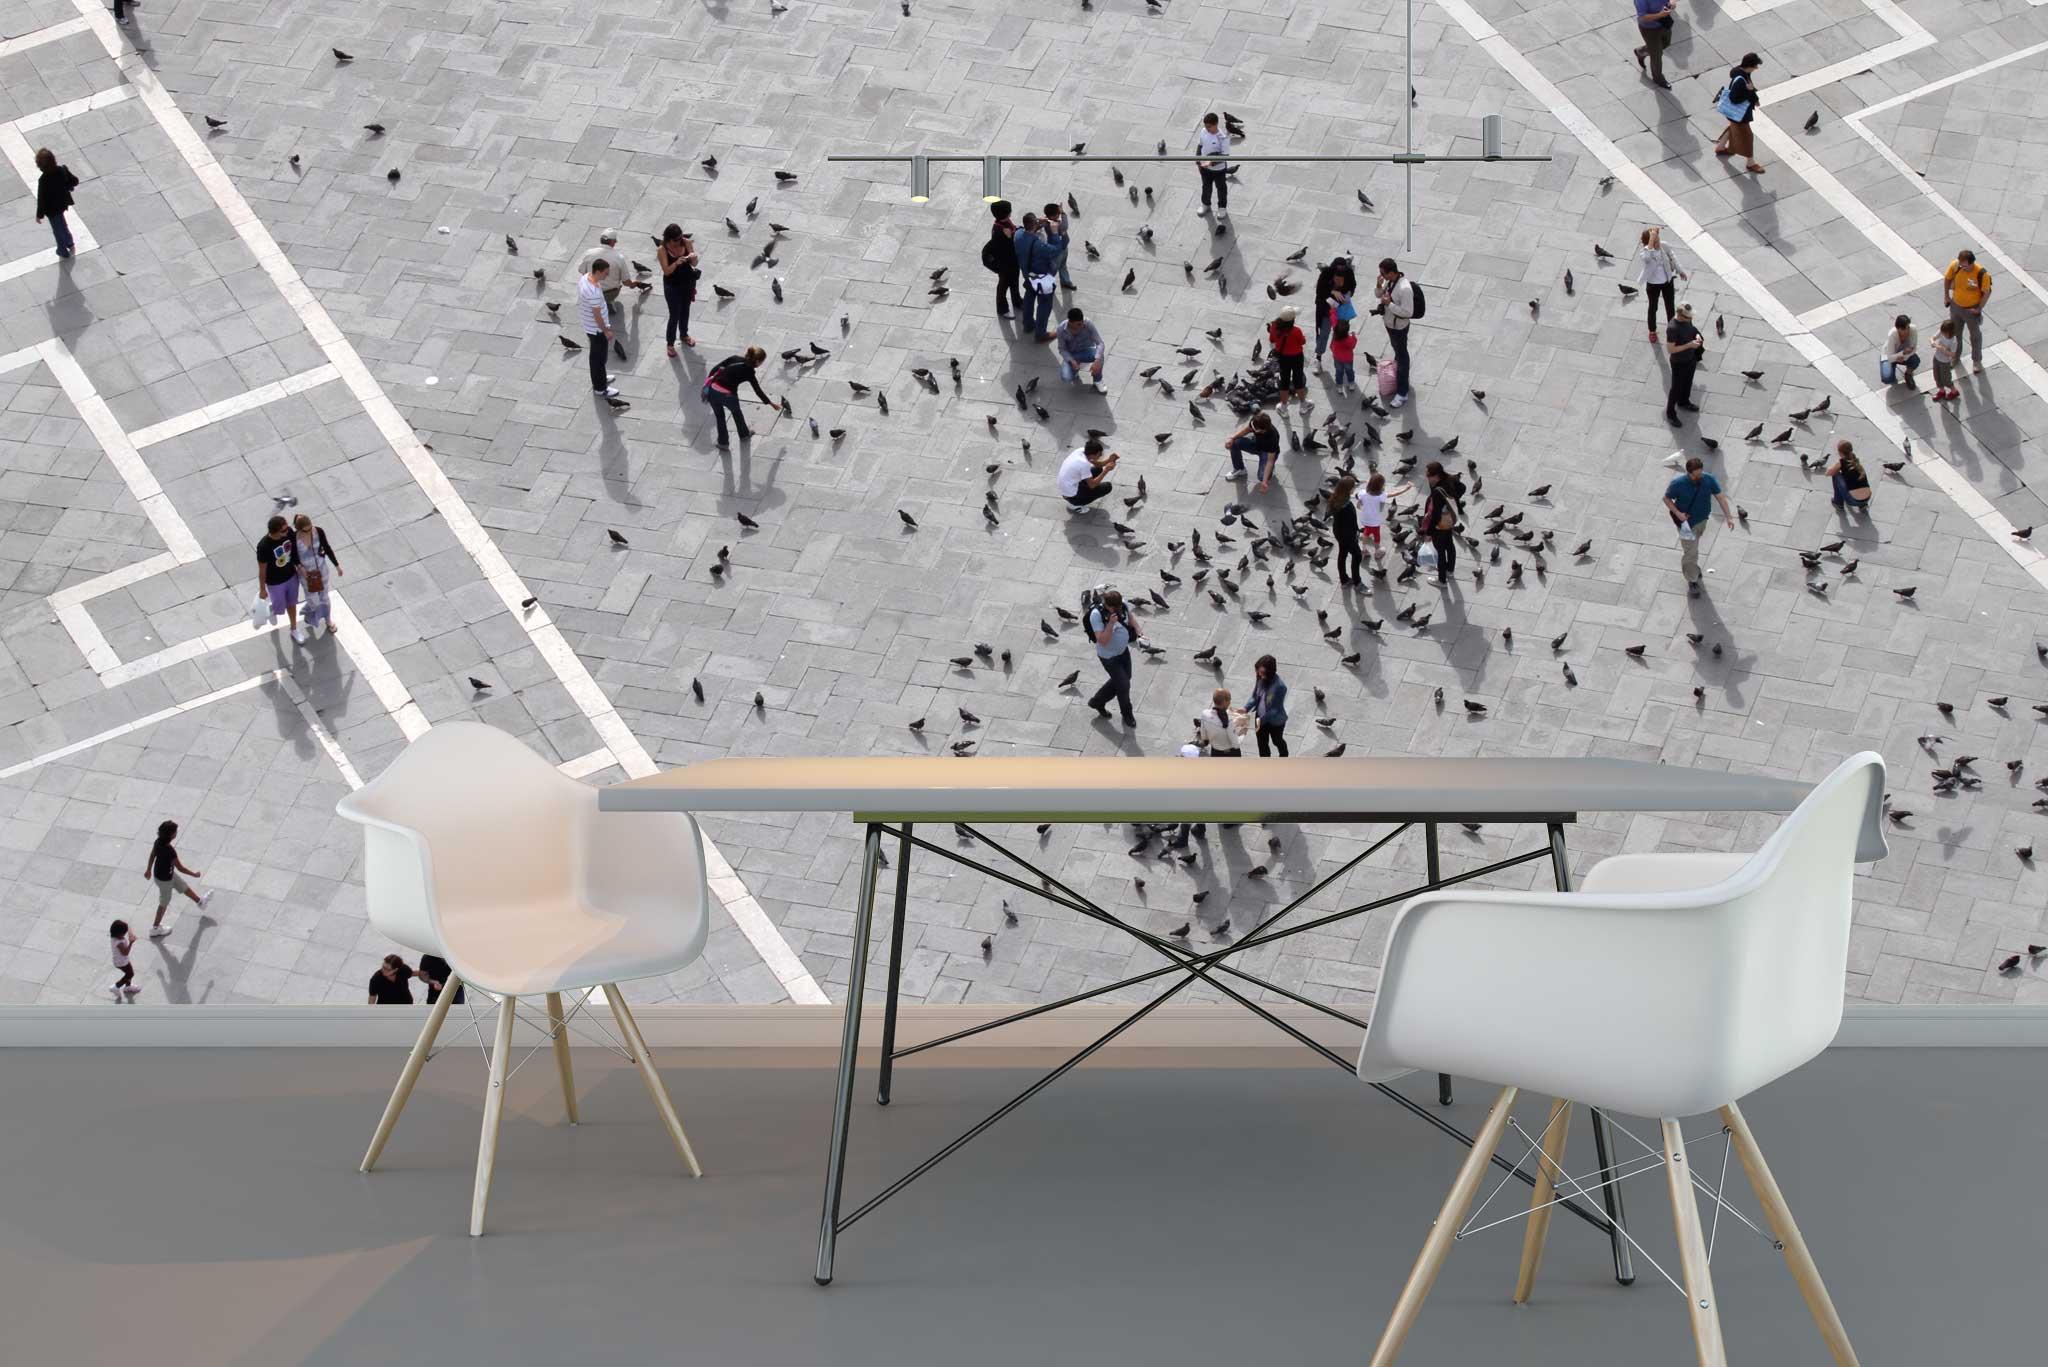 tapet-fototapet-comanda-personalizat-bucuresti-perete-special-lux-model-fotografie-aeriana-piata-oras-oameni